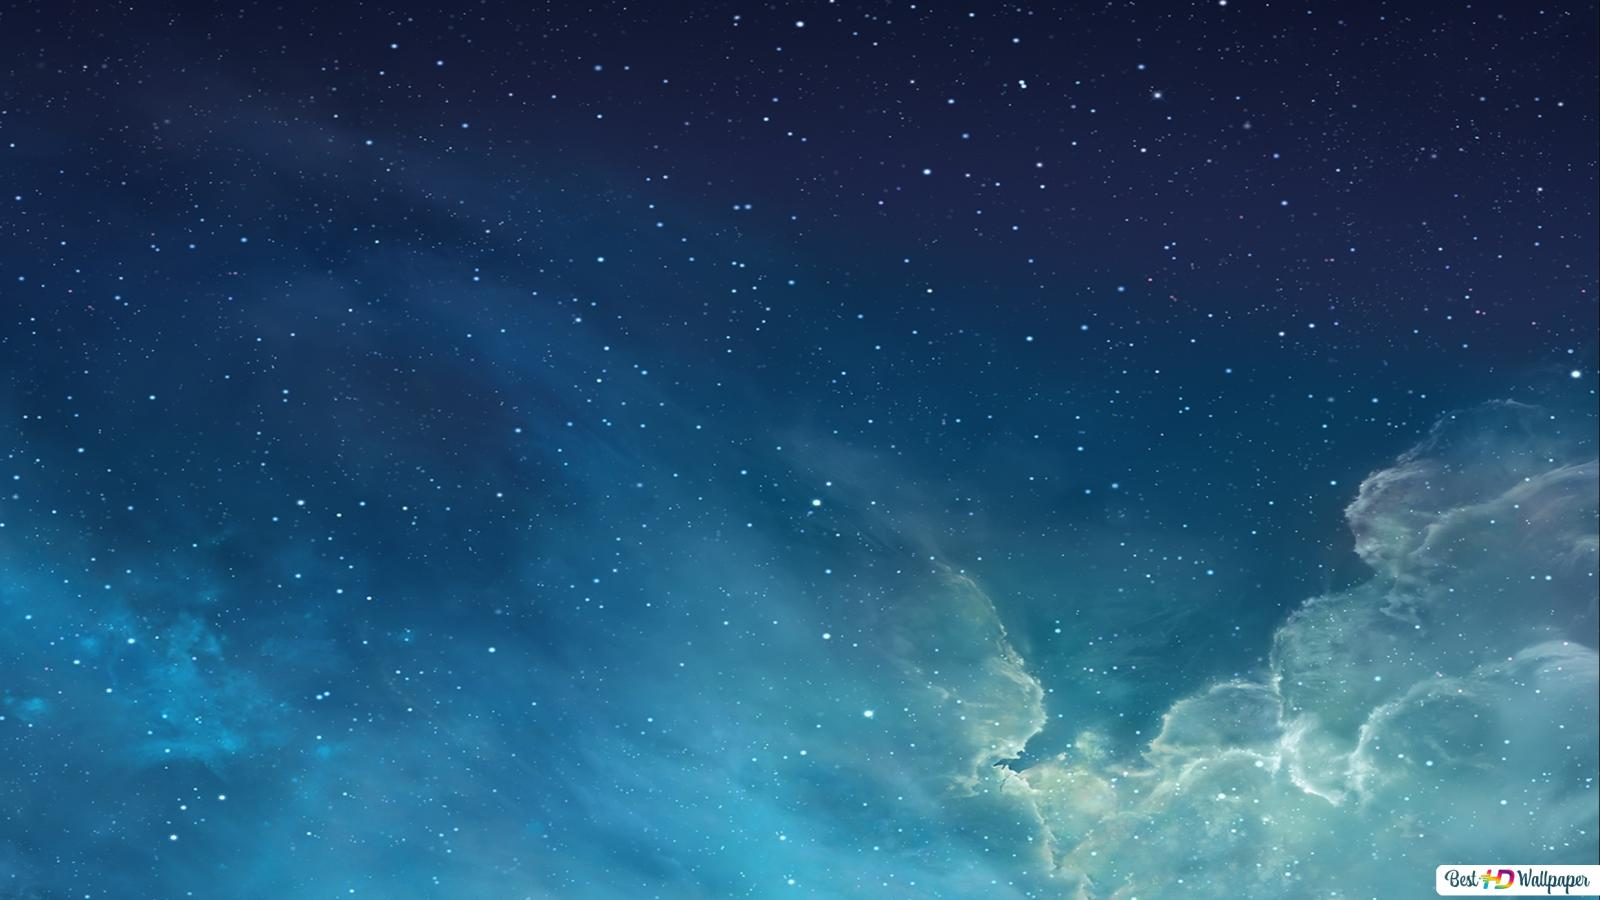 Ios 7銀河の壁紙 Hd壁紙のダウンロード